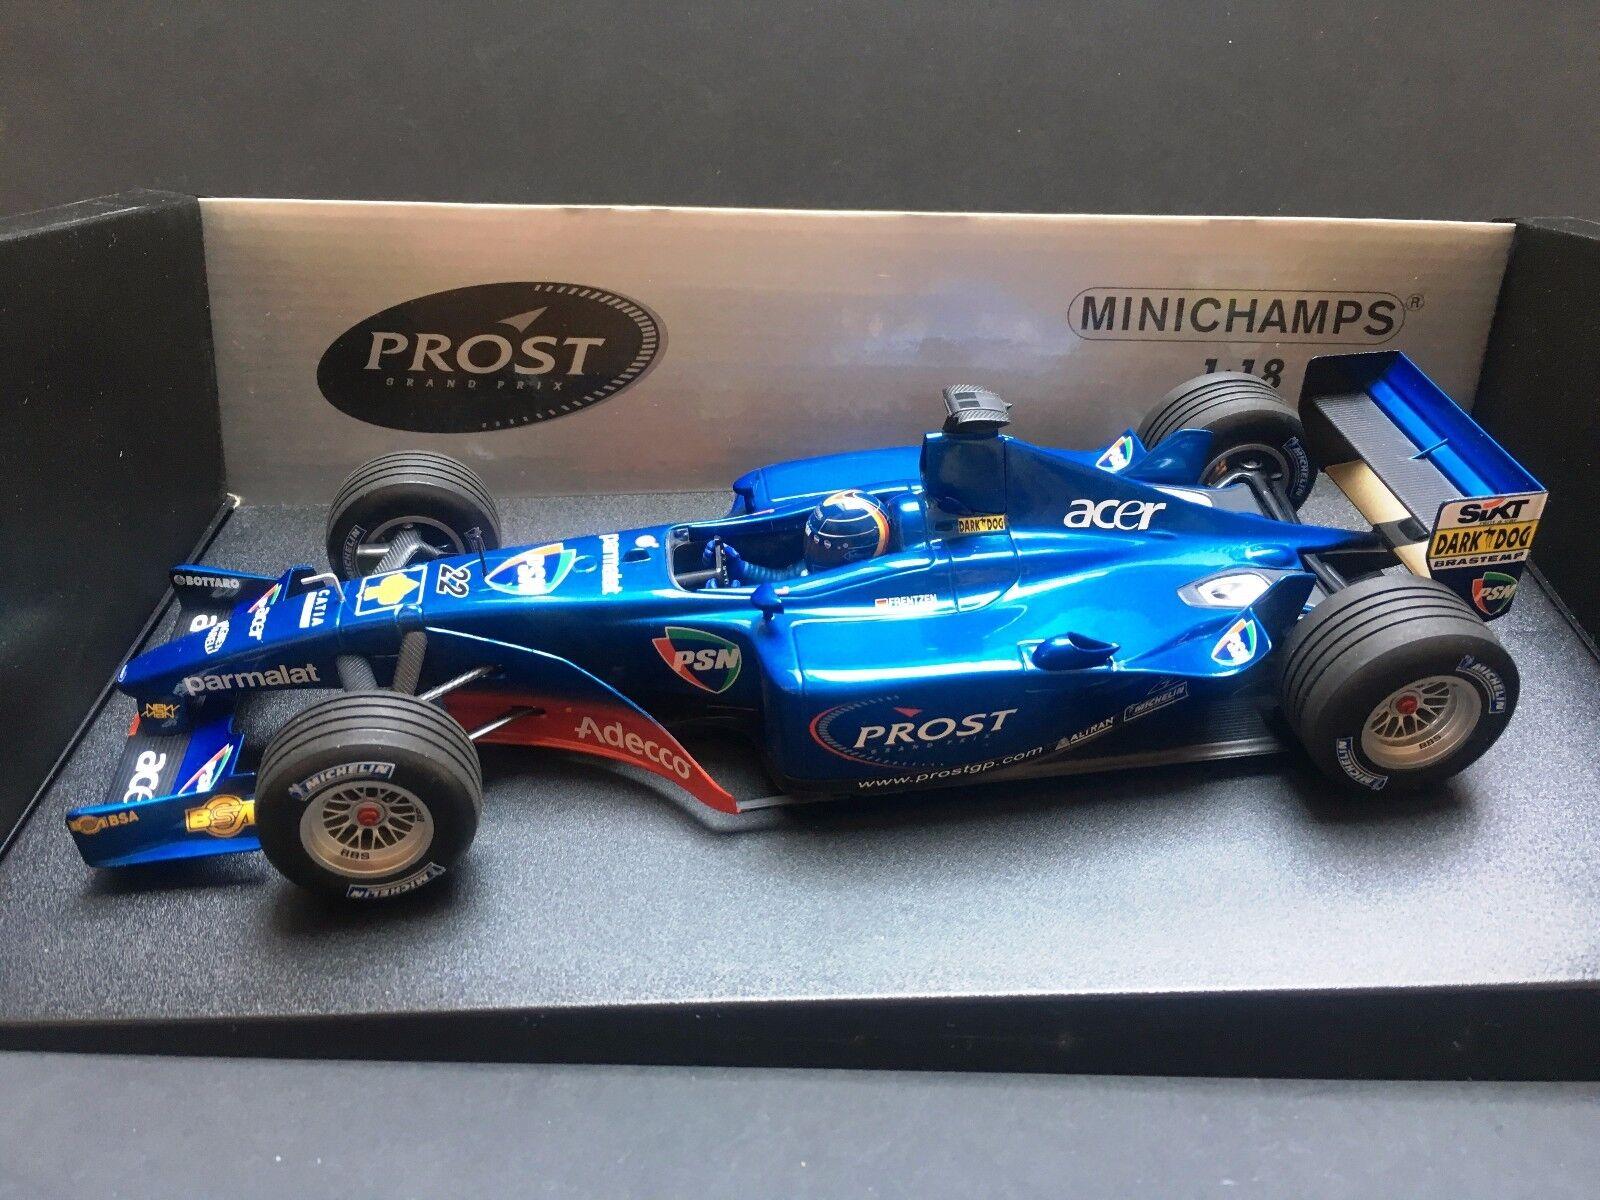 Minichamps - Heinz Harald Frentzen - Prost Acer - AP04 - 2001 - 1 18 - very rare